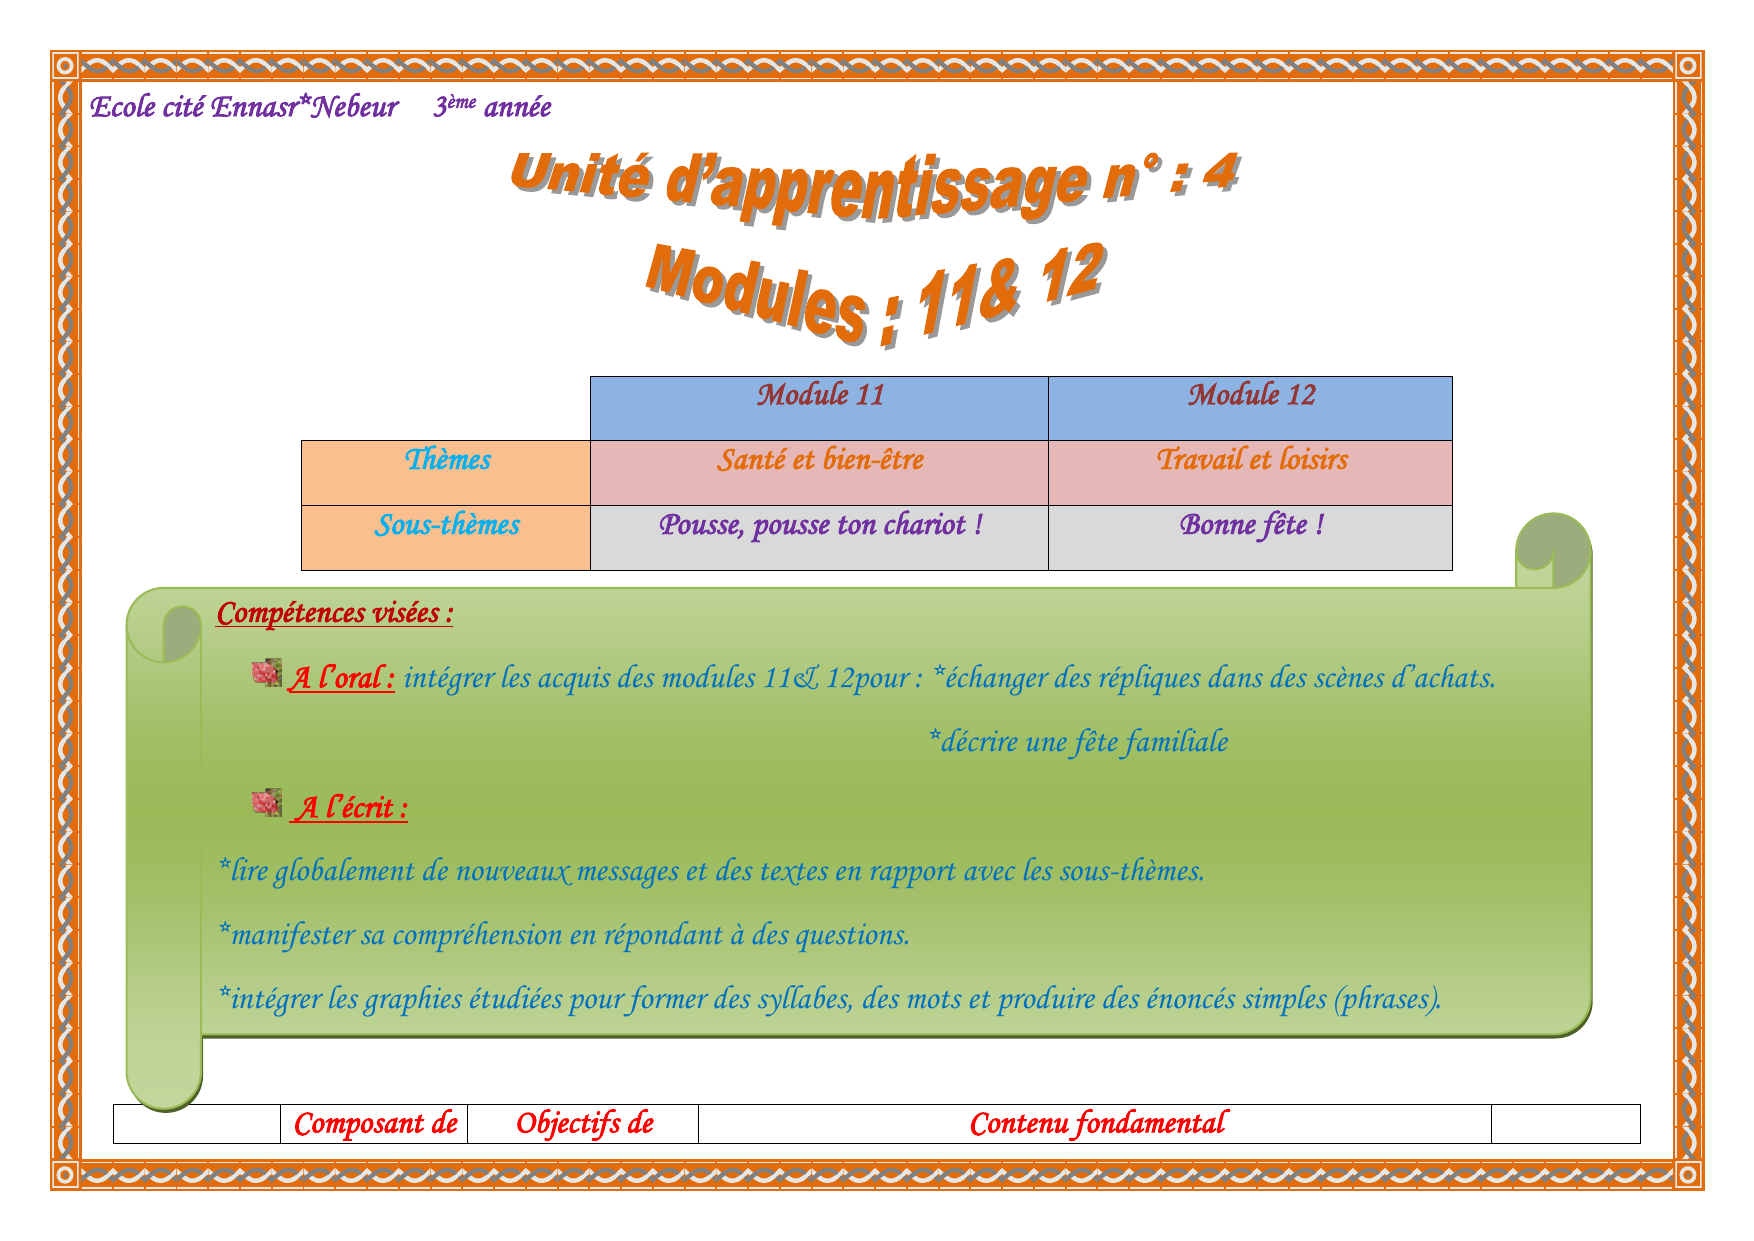 Ecole Cit EnnasrNebeur 3me Anne Module 11 12